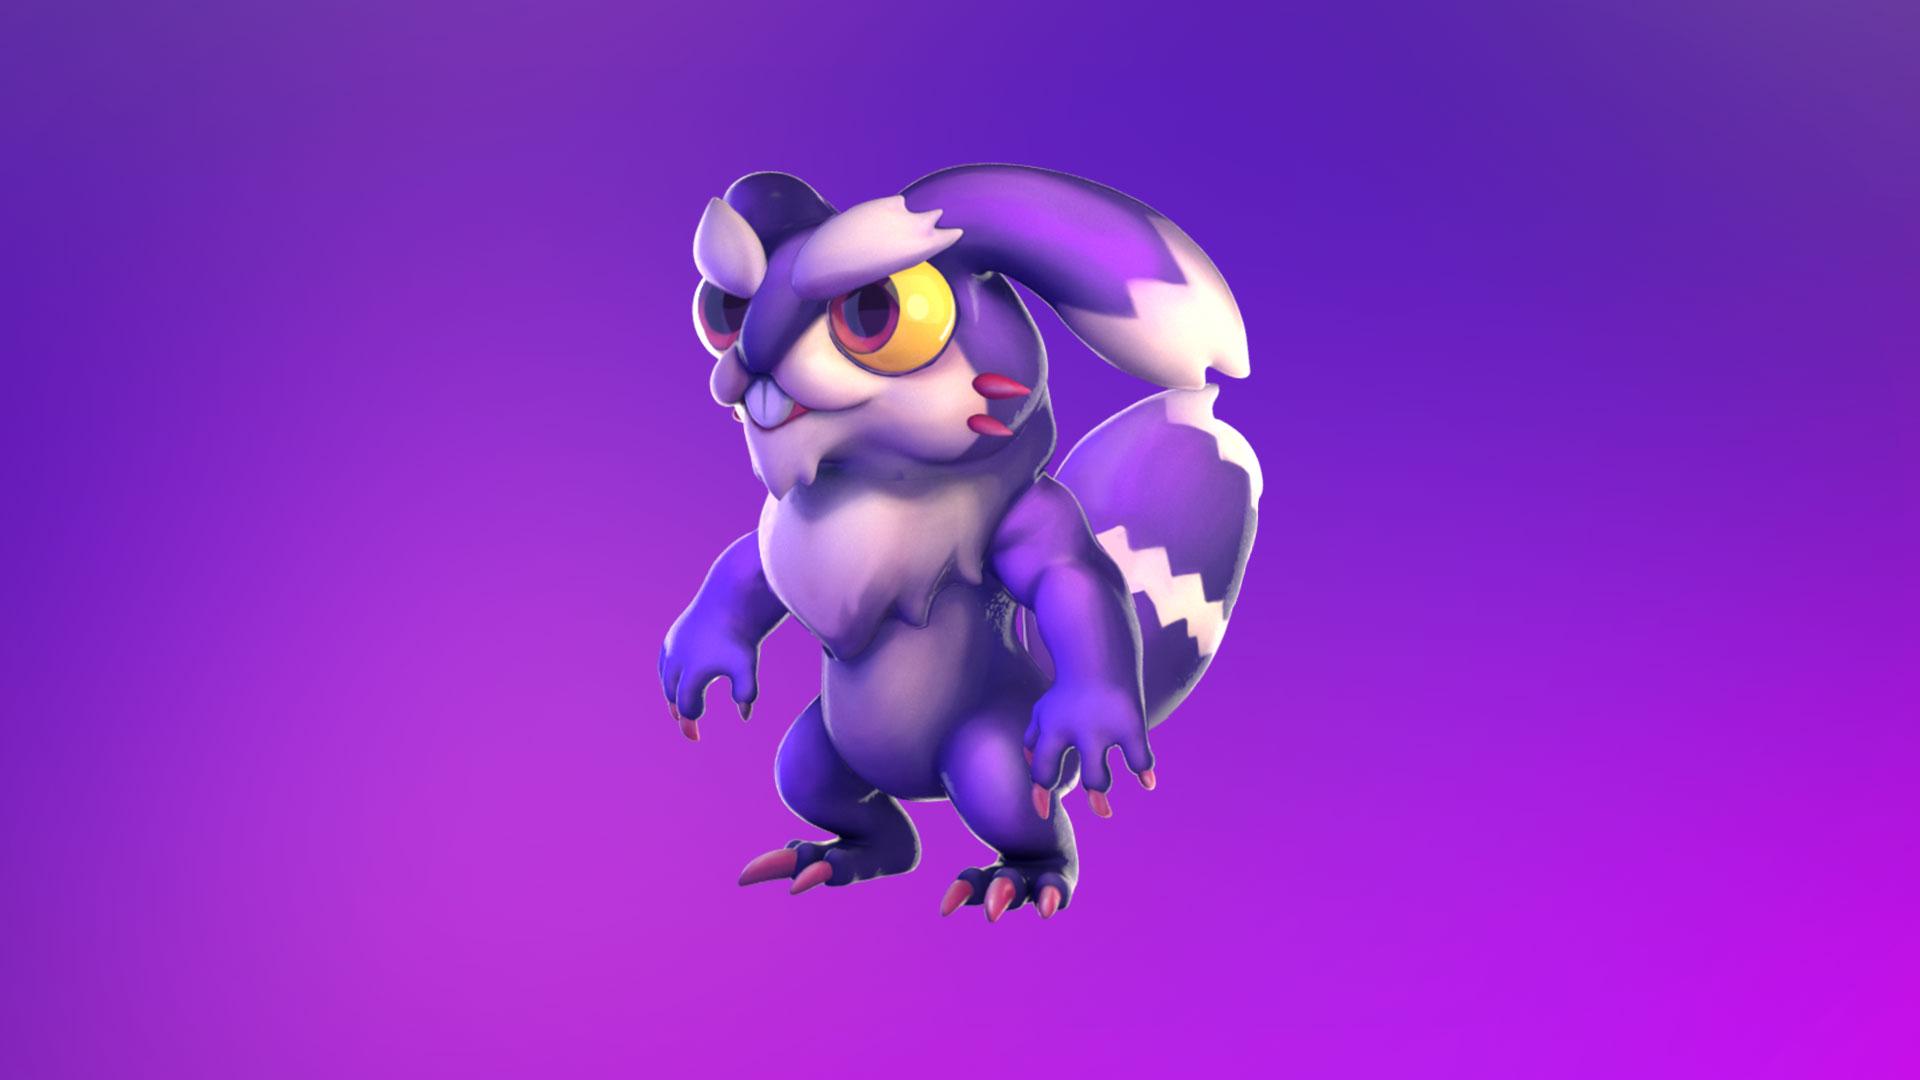 development 2D video games characters